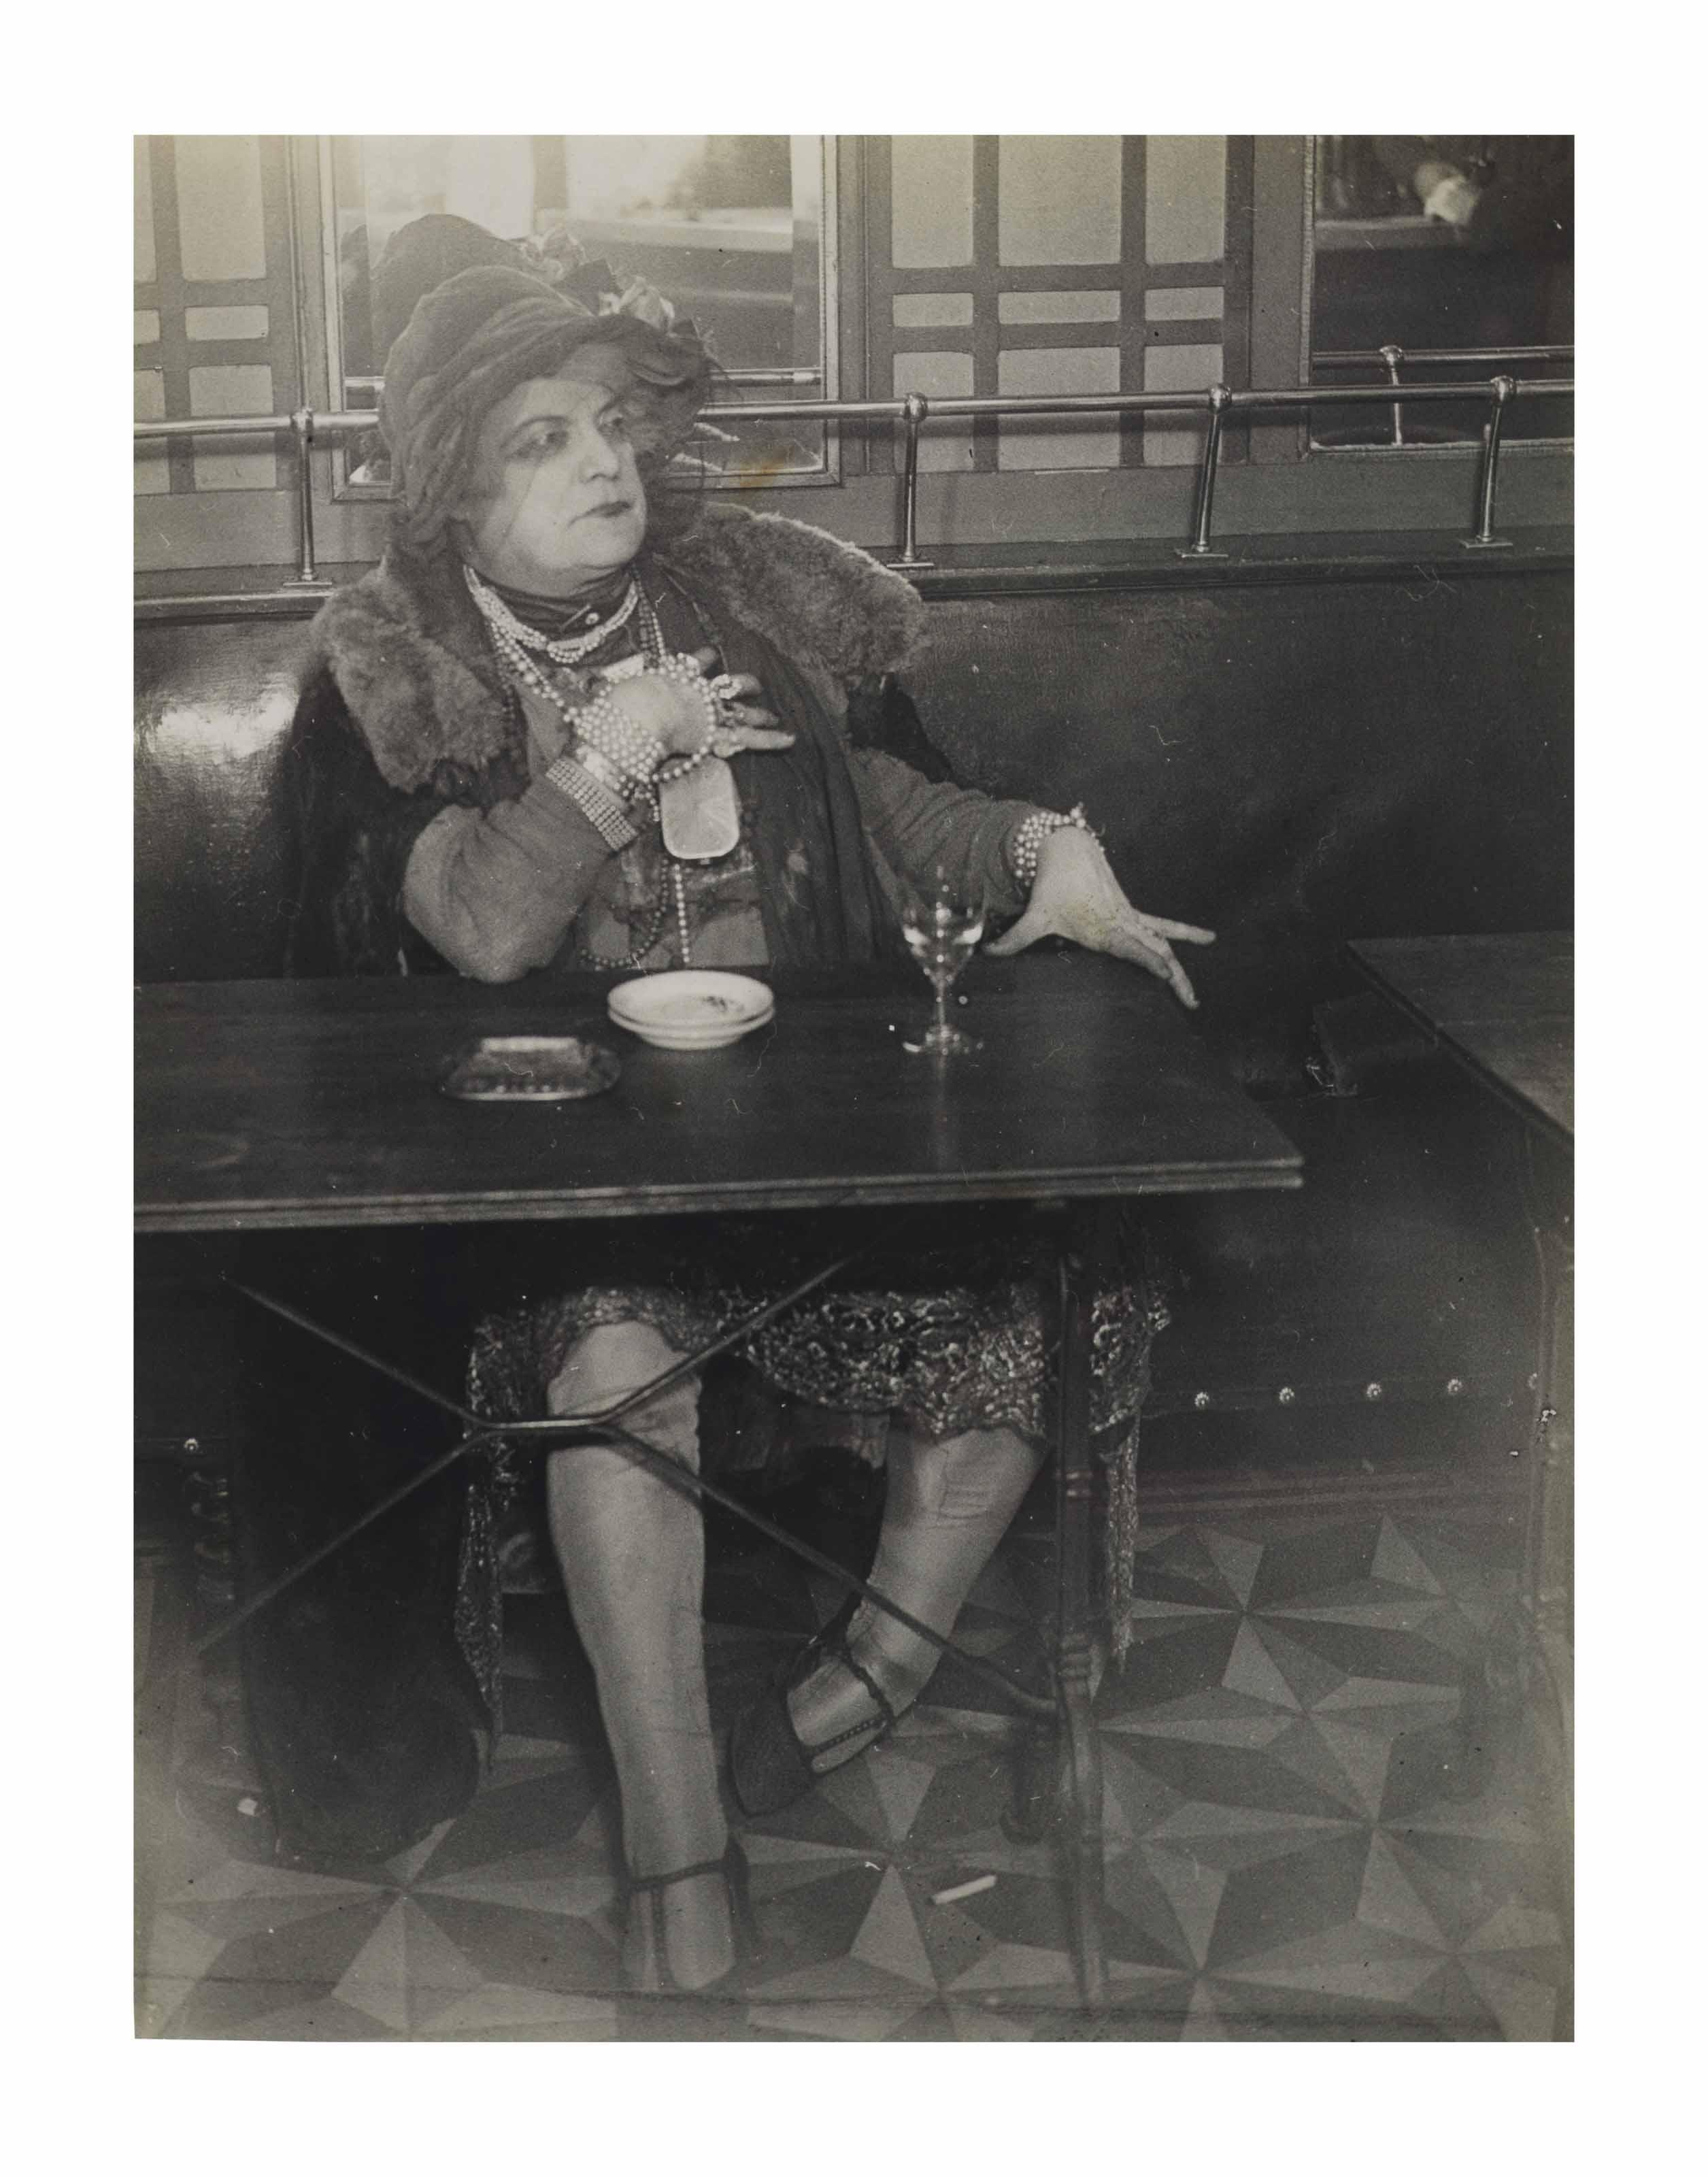 La Môme Bijou, Bar de la Lune, Paris, c. 1932